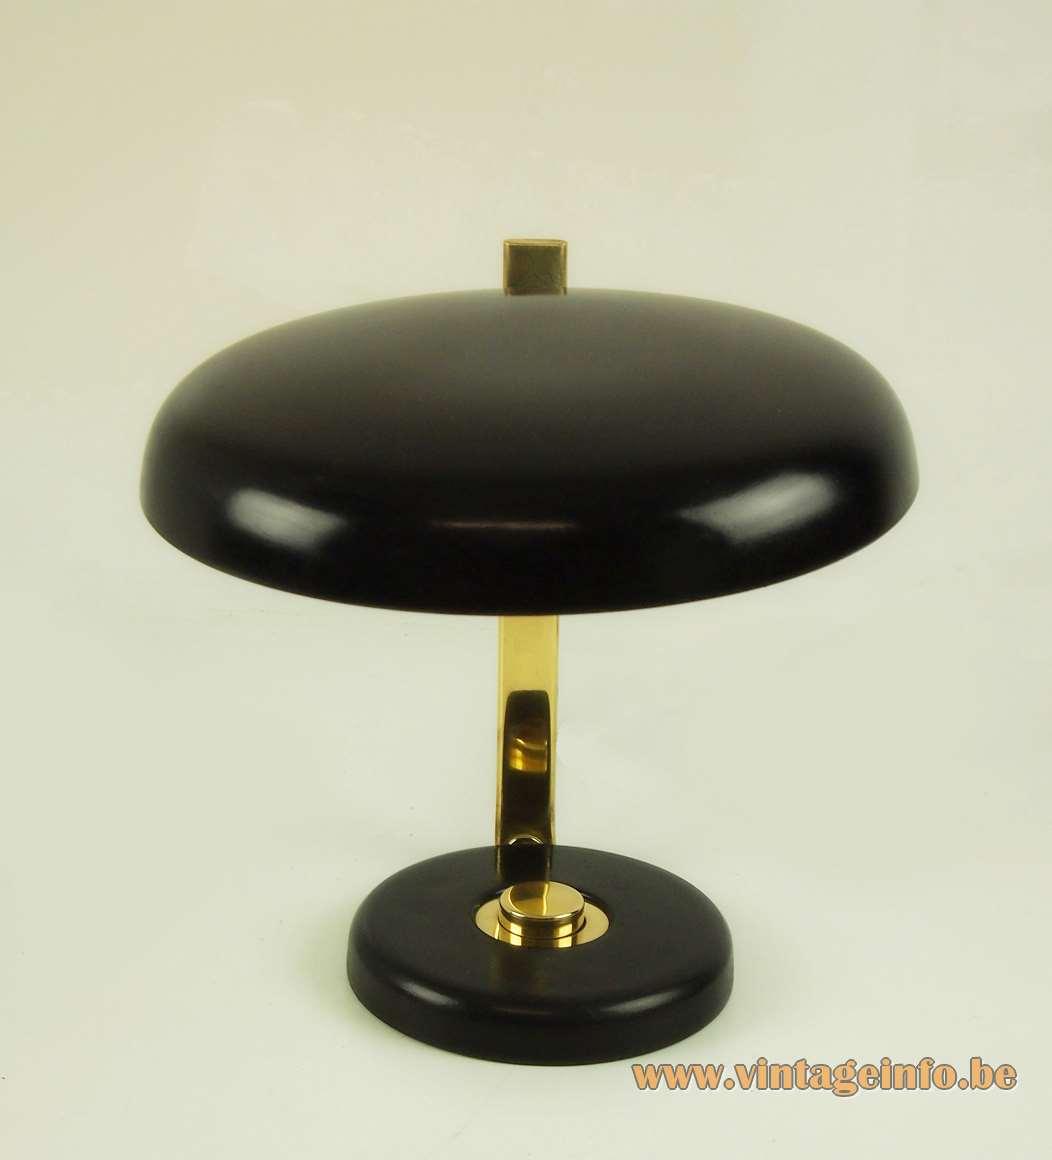 Hillebrand Desk Lamp 7004